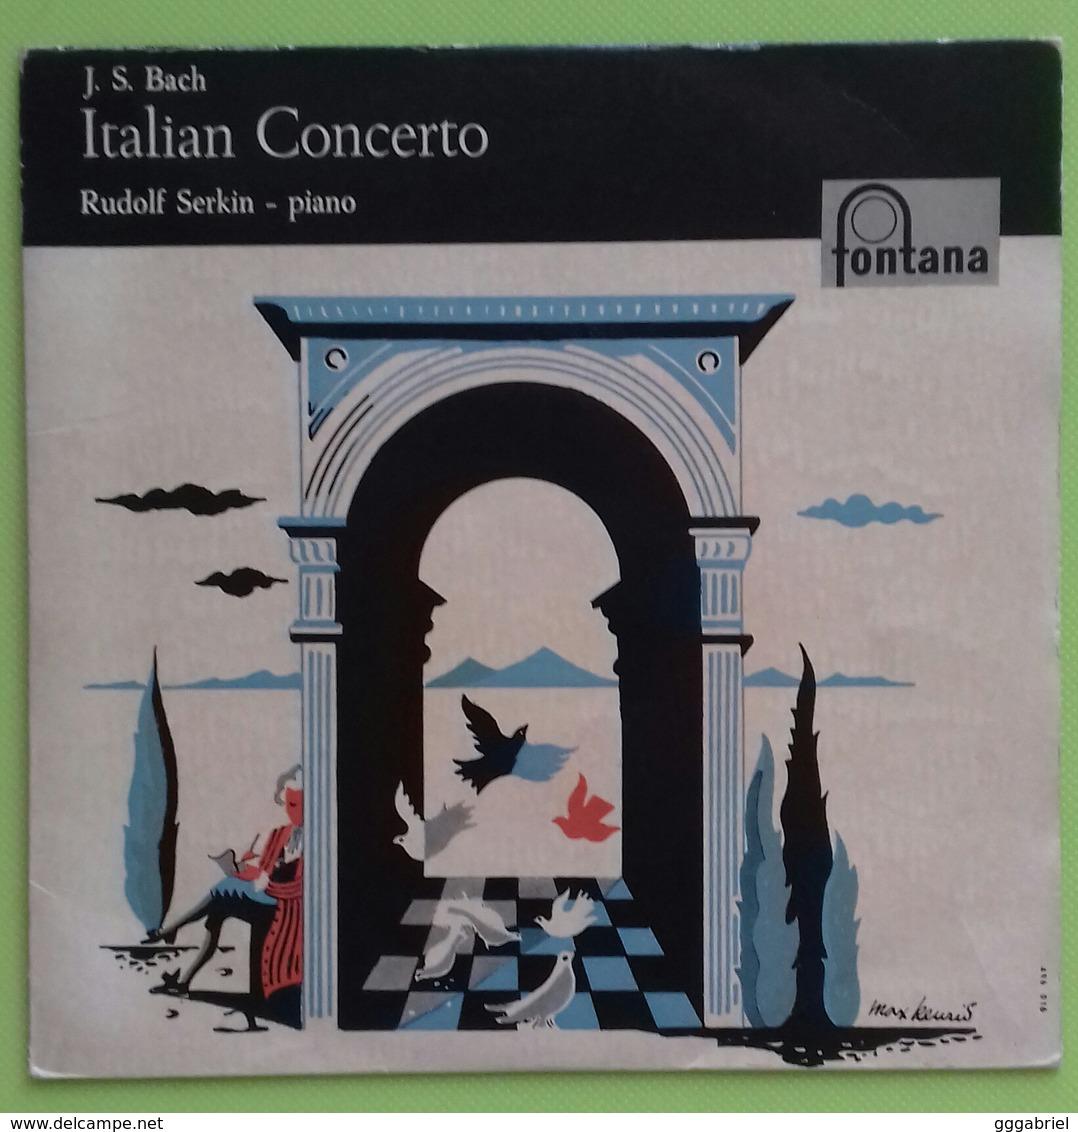 "J.S. BACH - ITALIAN CONCERTO - Rudolf Serkin - Piano - EP 7"" - Fontana - Printed In Italy - 45 Giri - Classical"